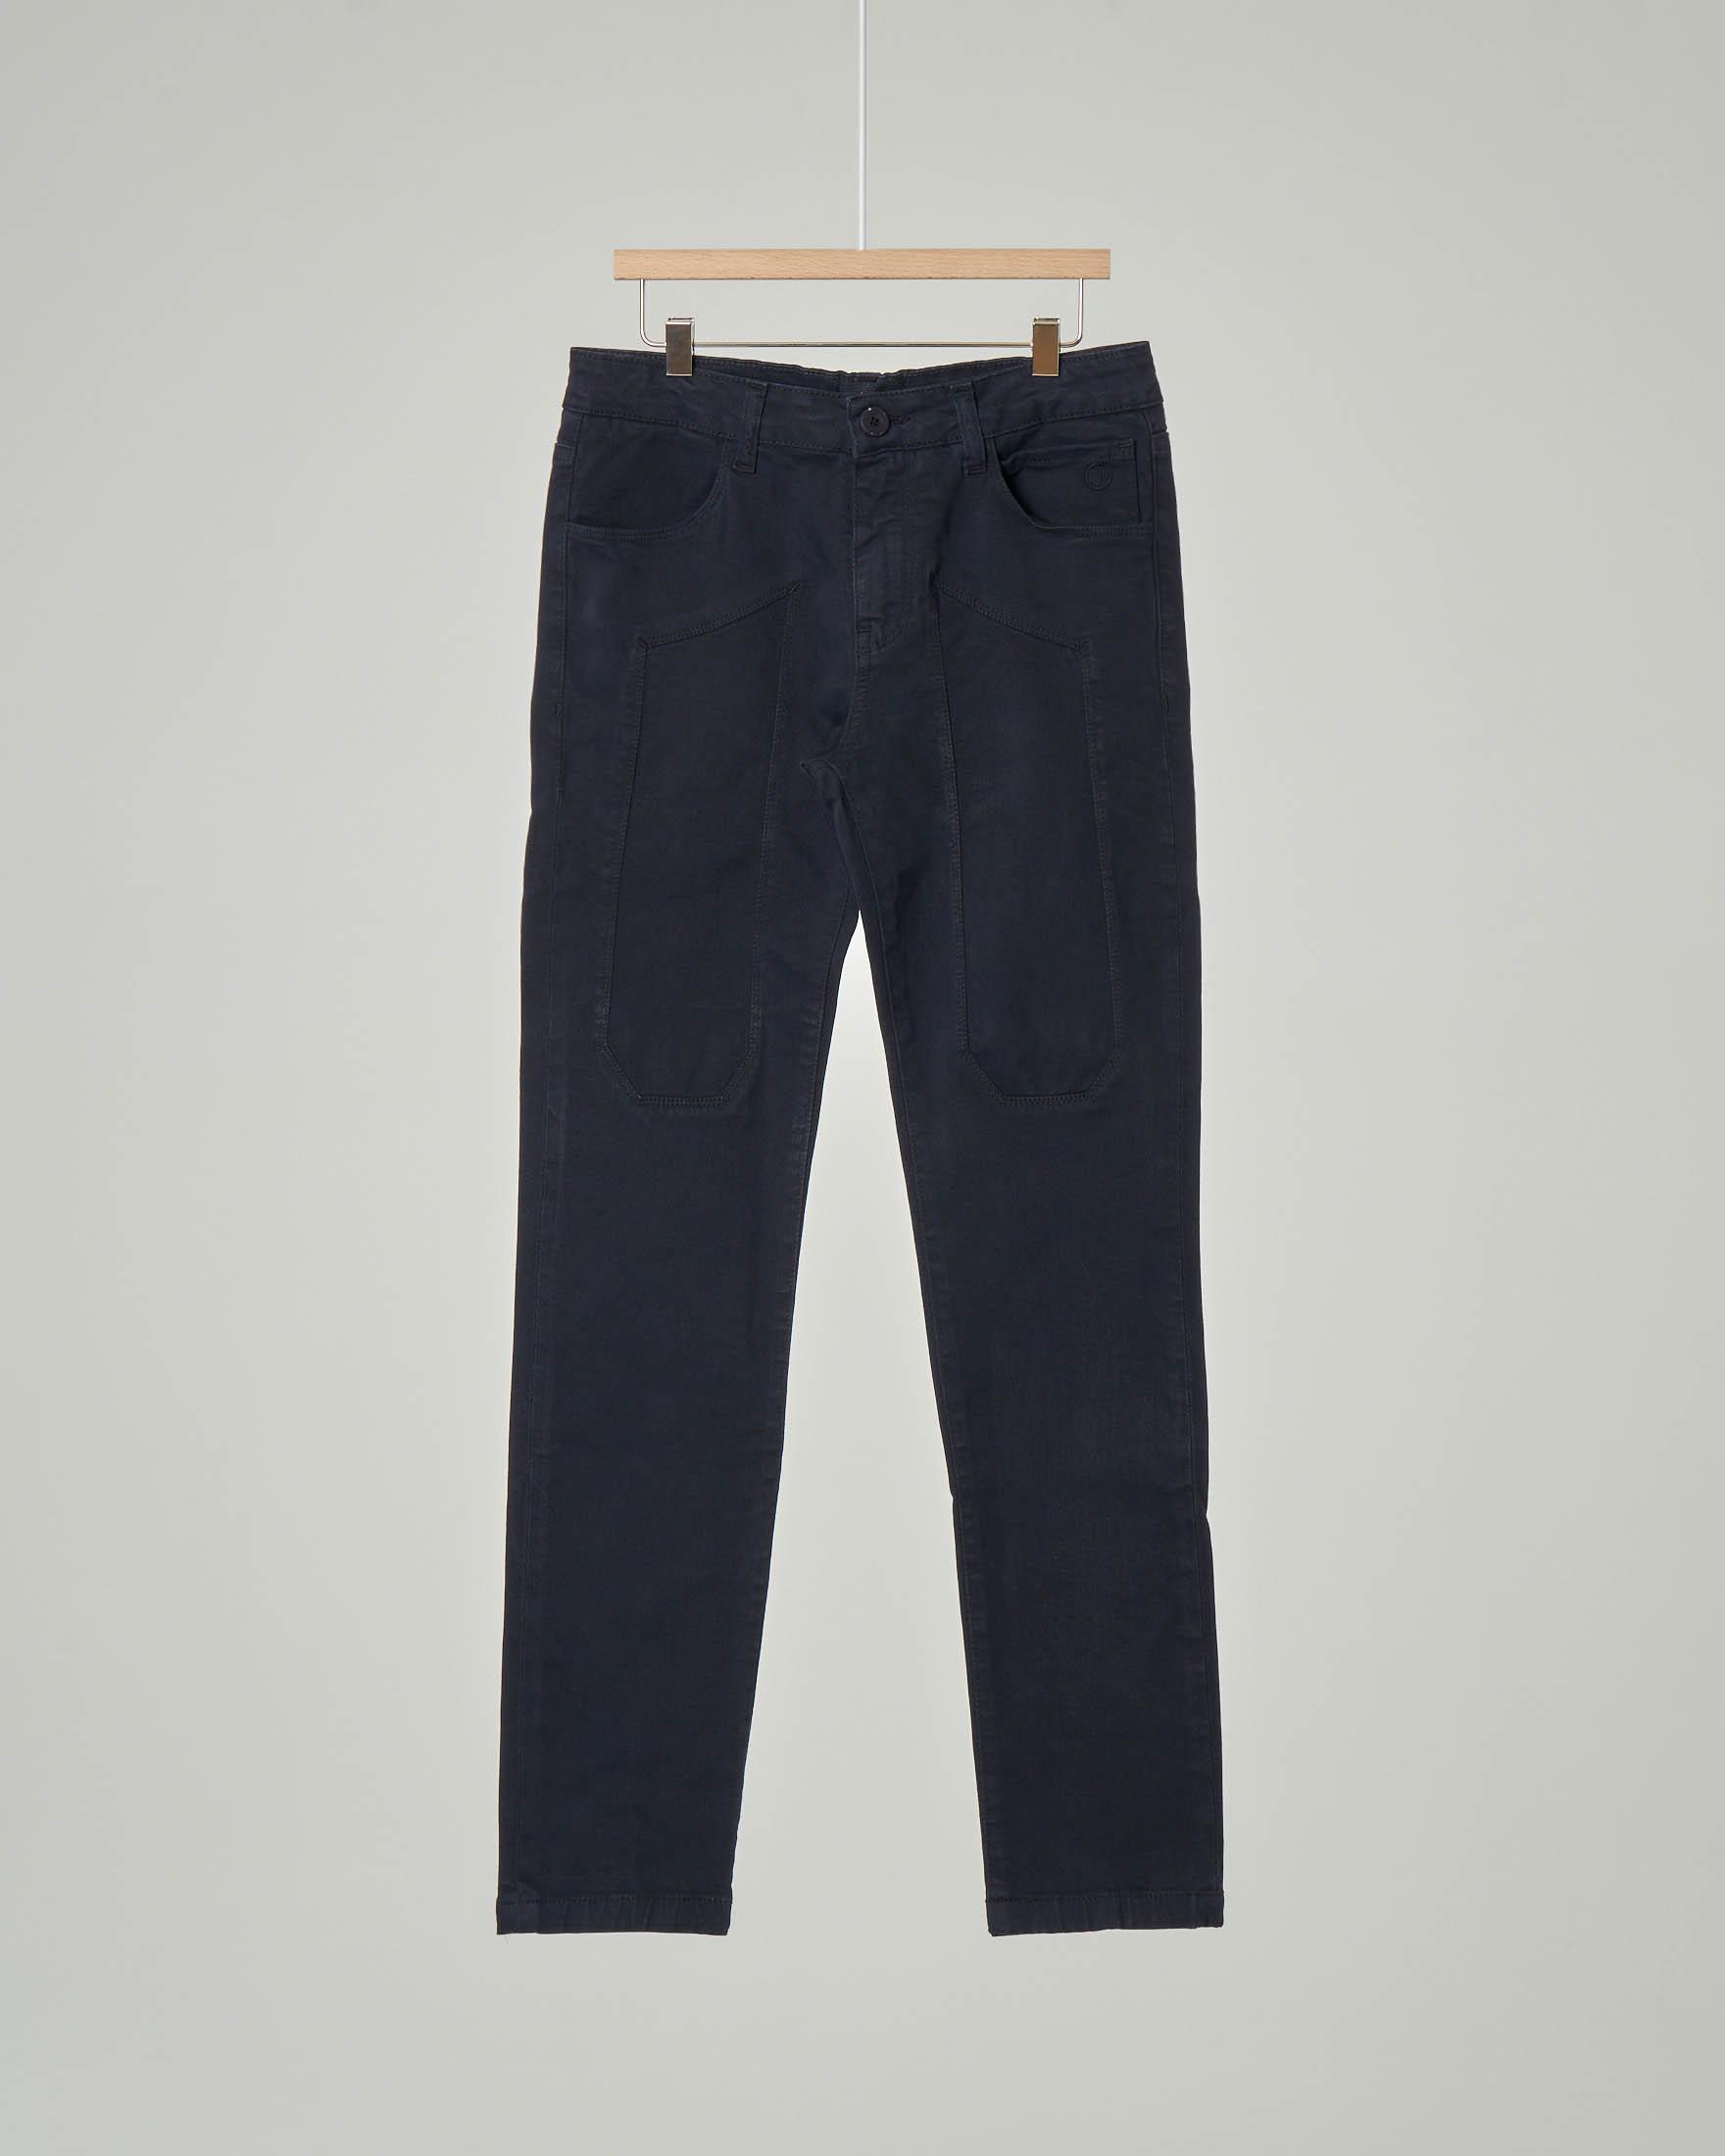 Pantalone blu cinque tasche in gabardina stretch con toppa 8-18 anni